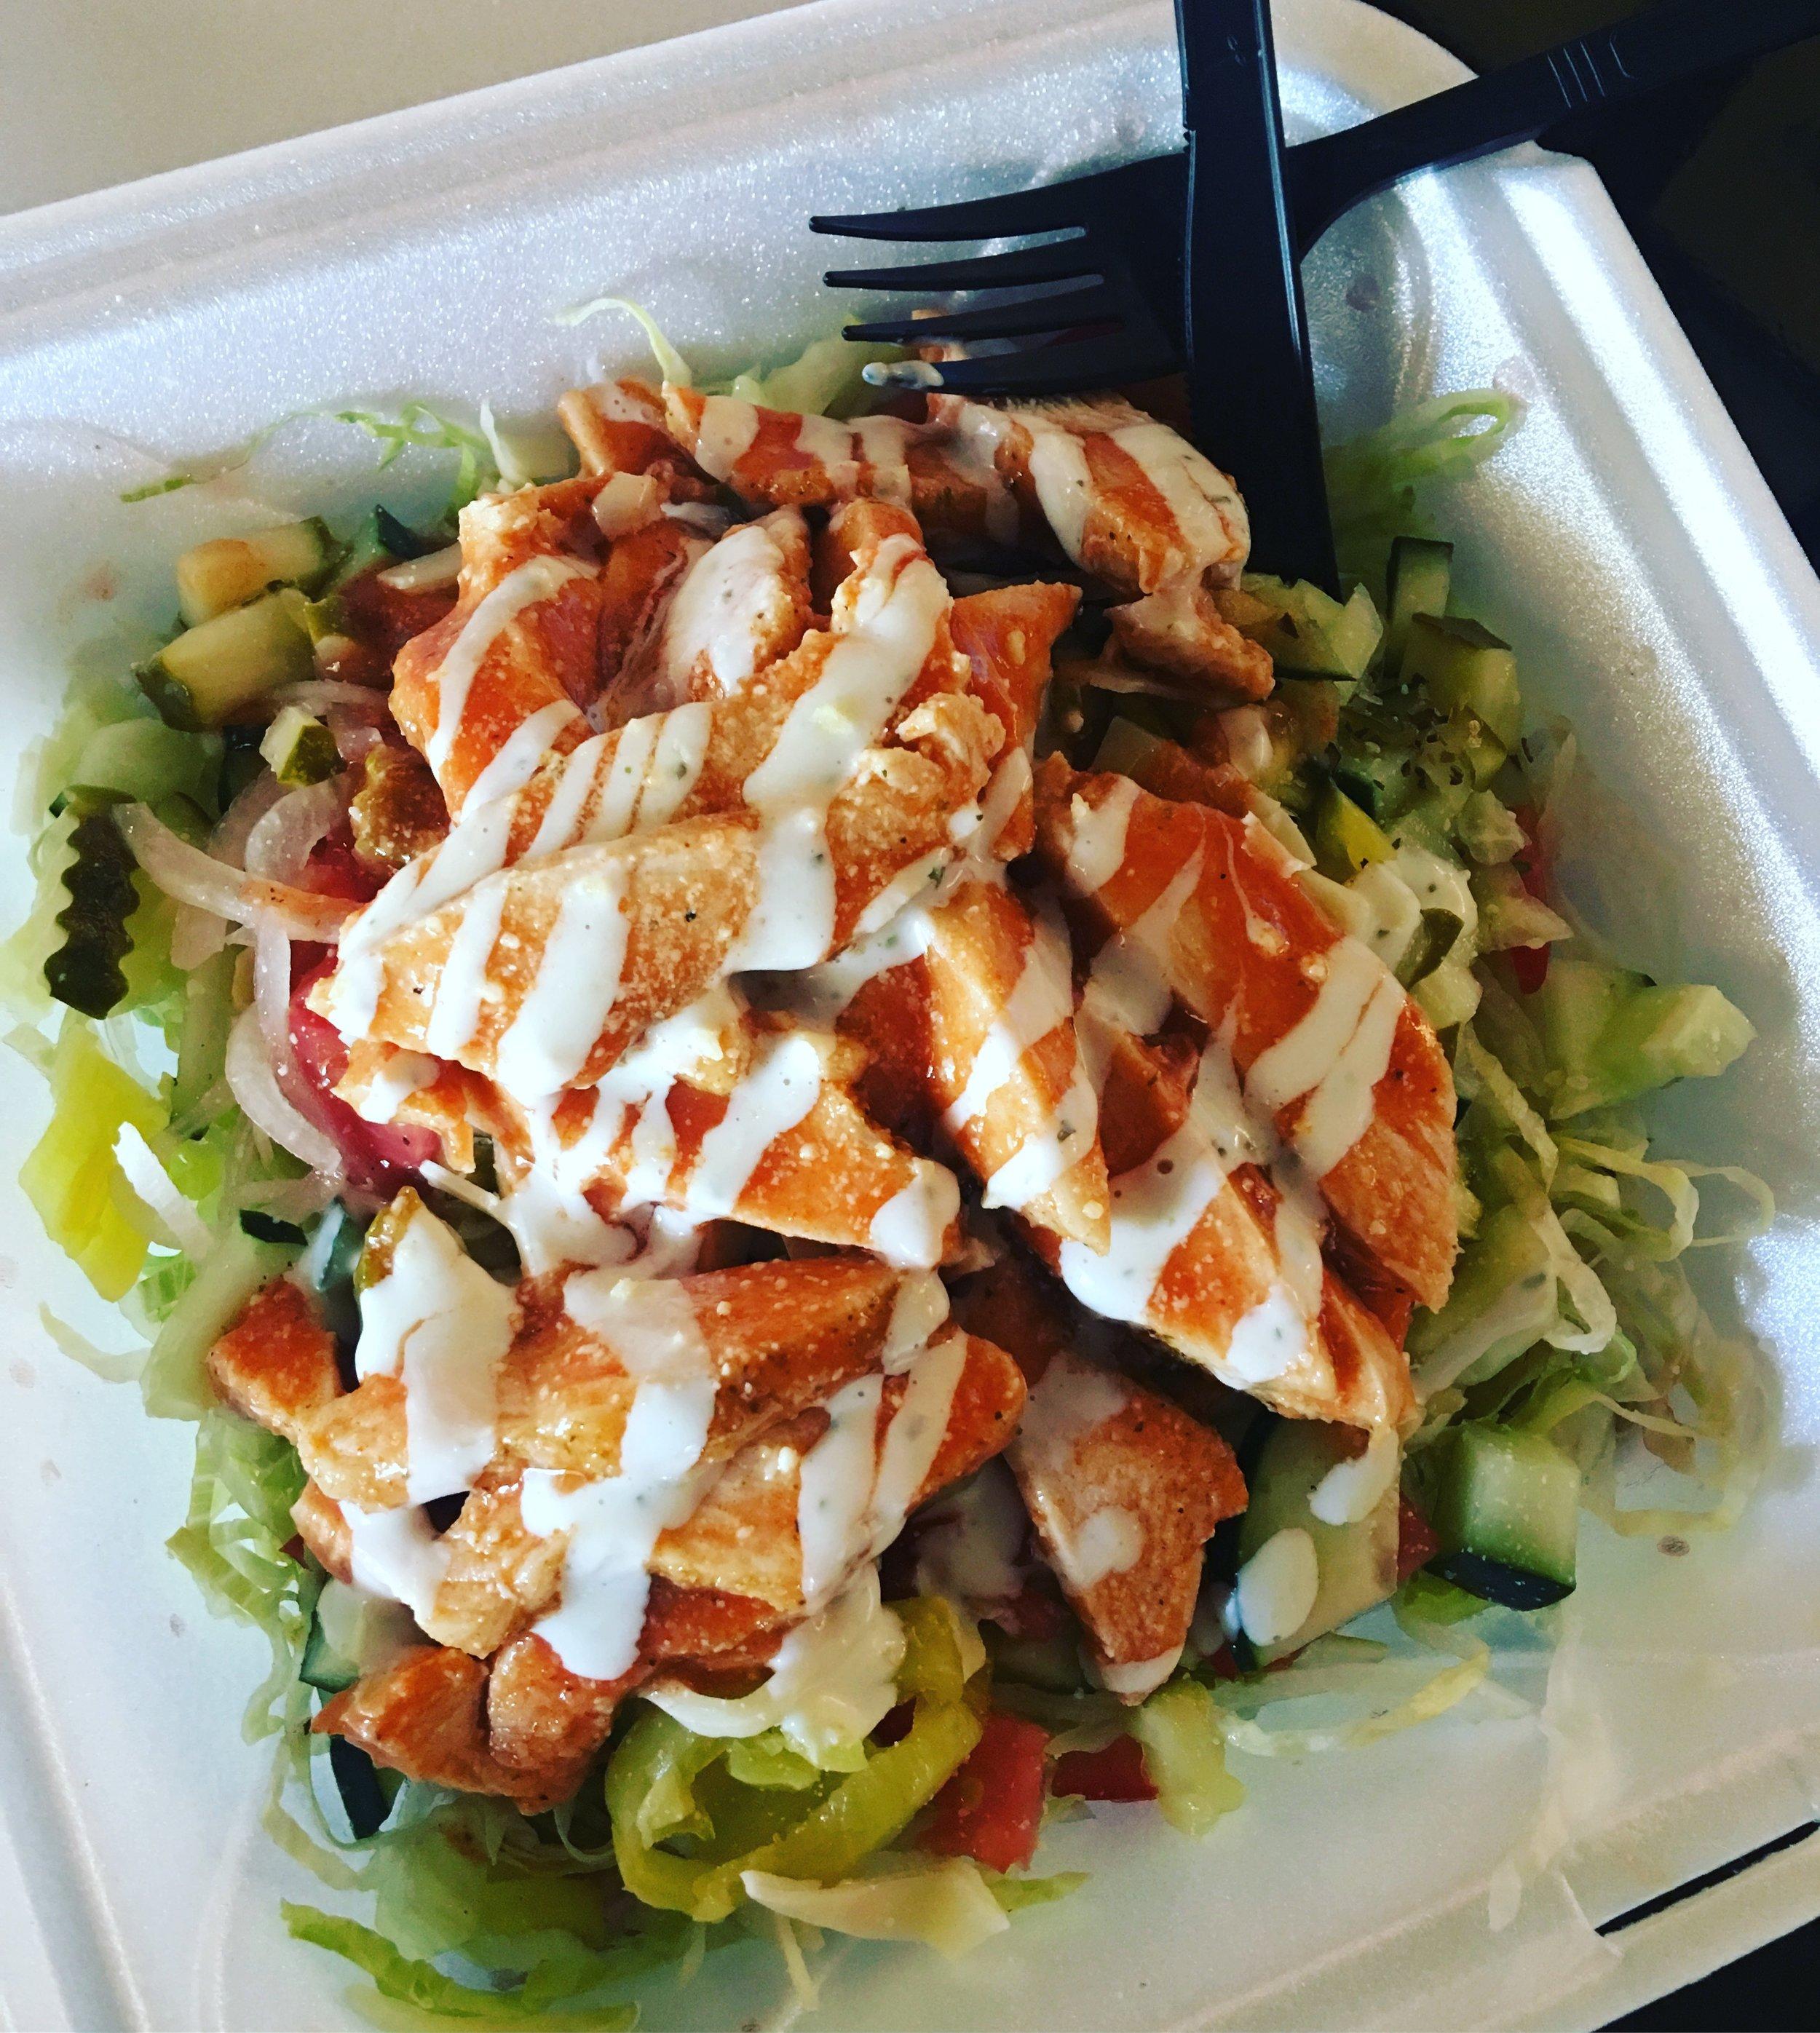 Dagwoods Deli and Sub Shop Buffalo Chicken Salad